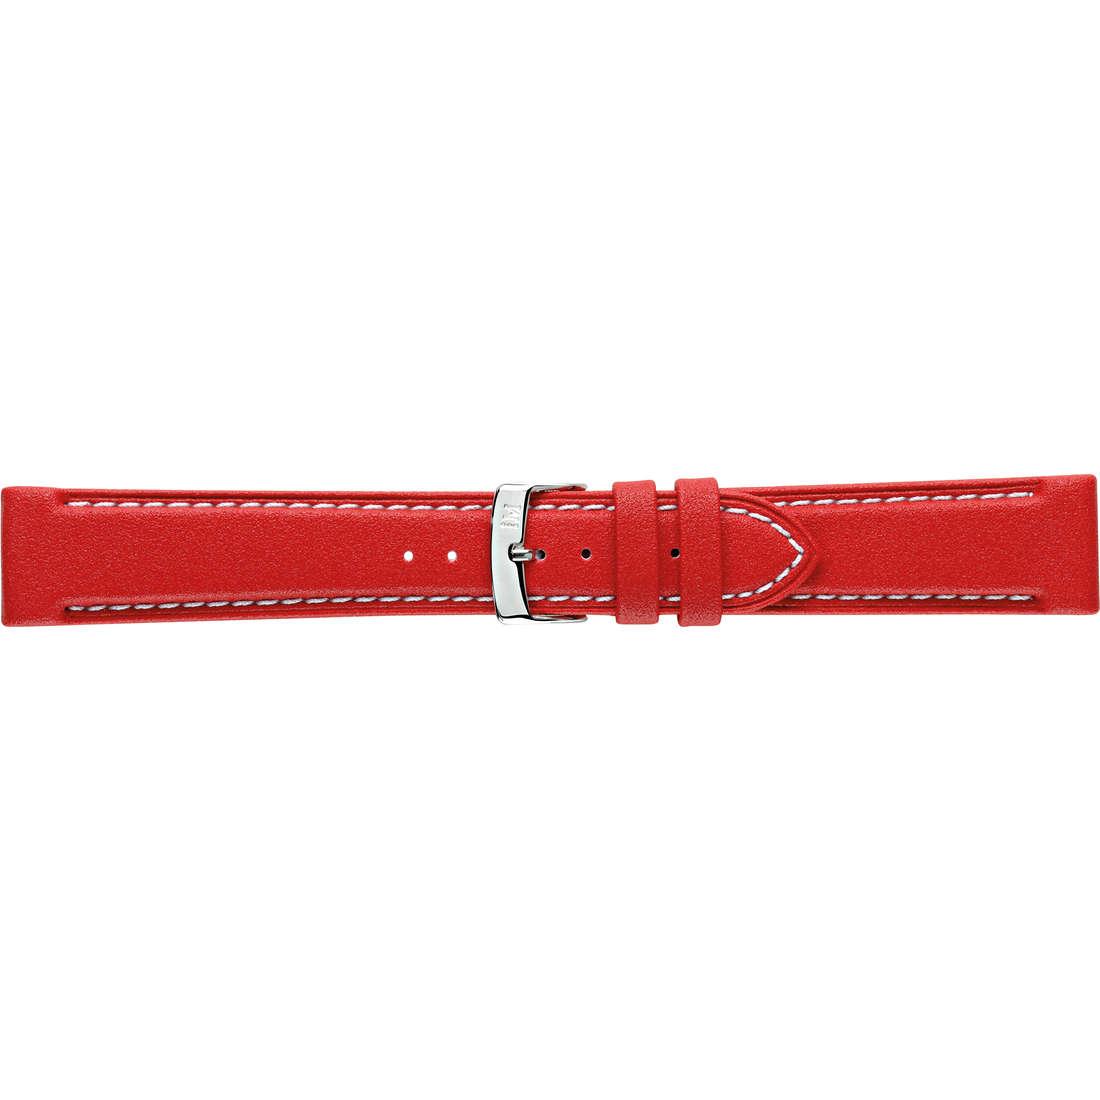 watch watch bands watch straps man Morellato Linea Sport A01U3822A42083CR18